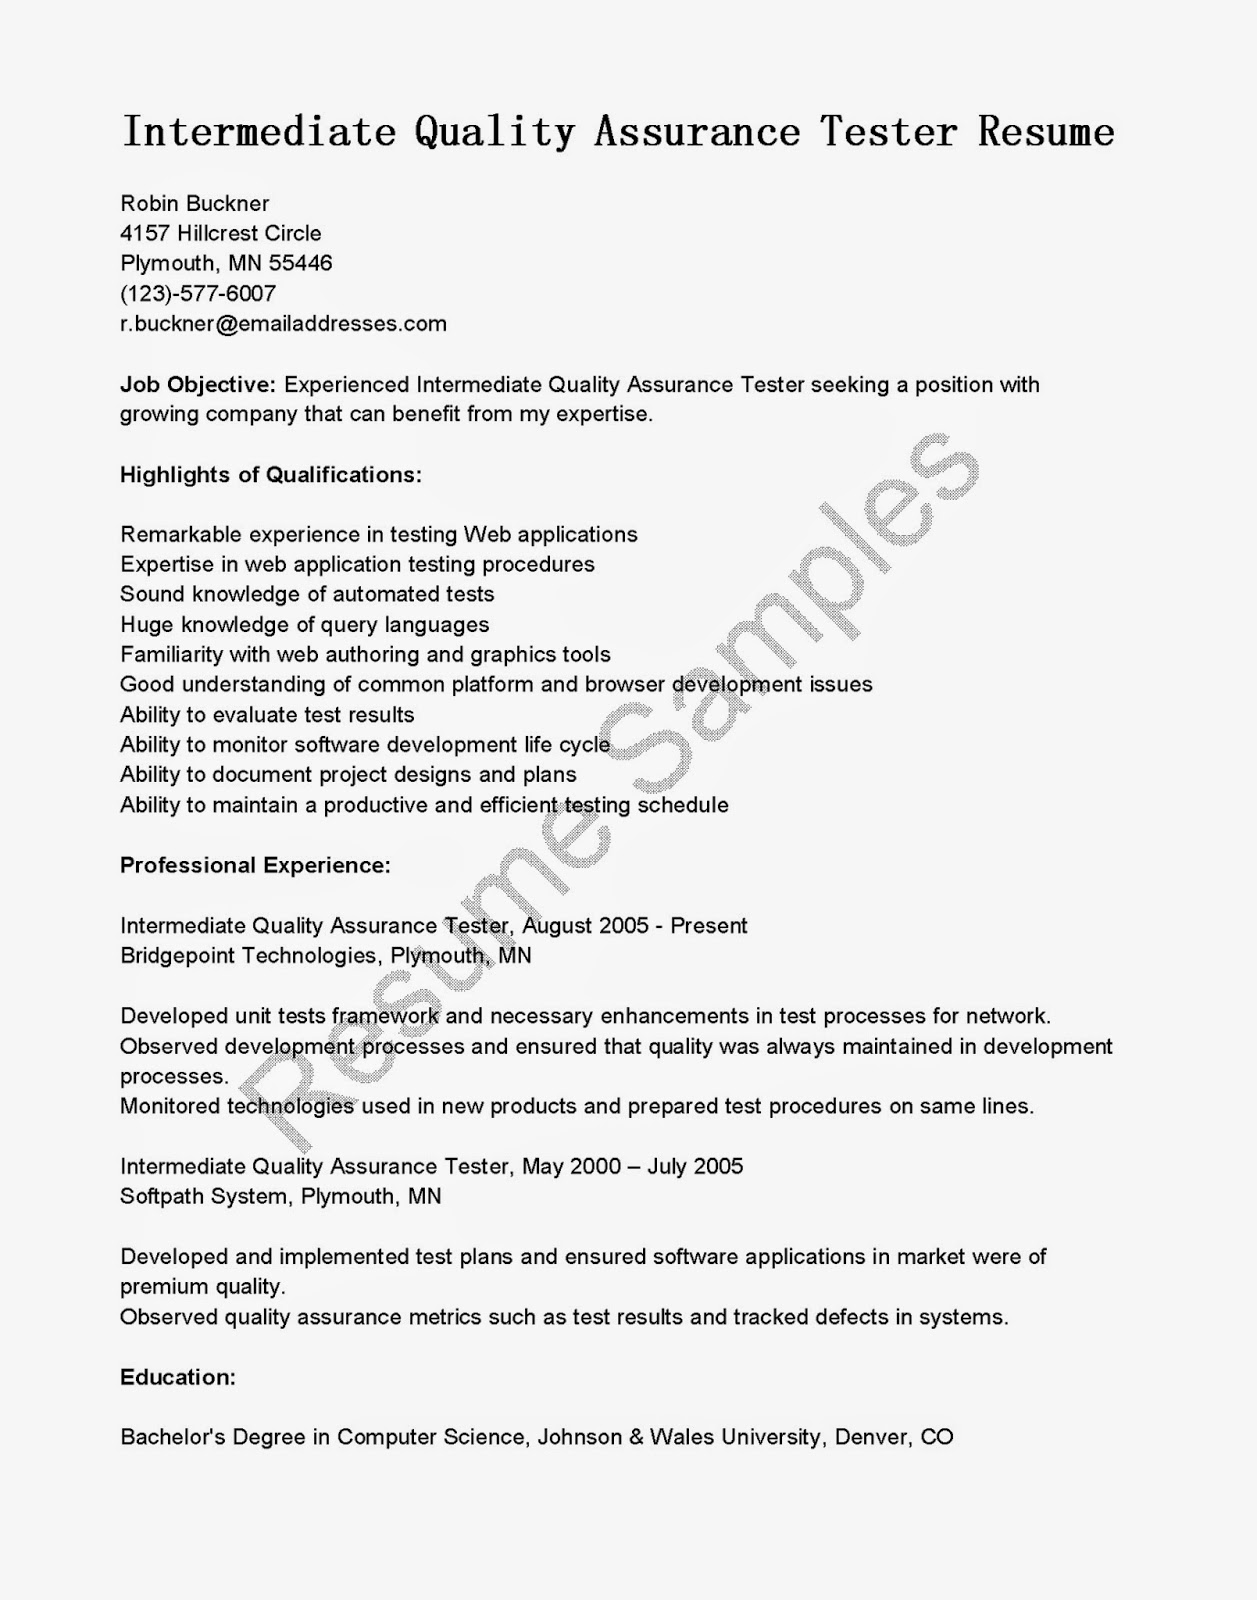 quality assurance technologist resume